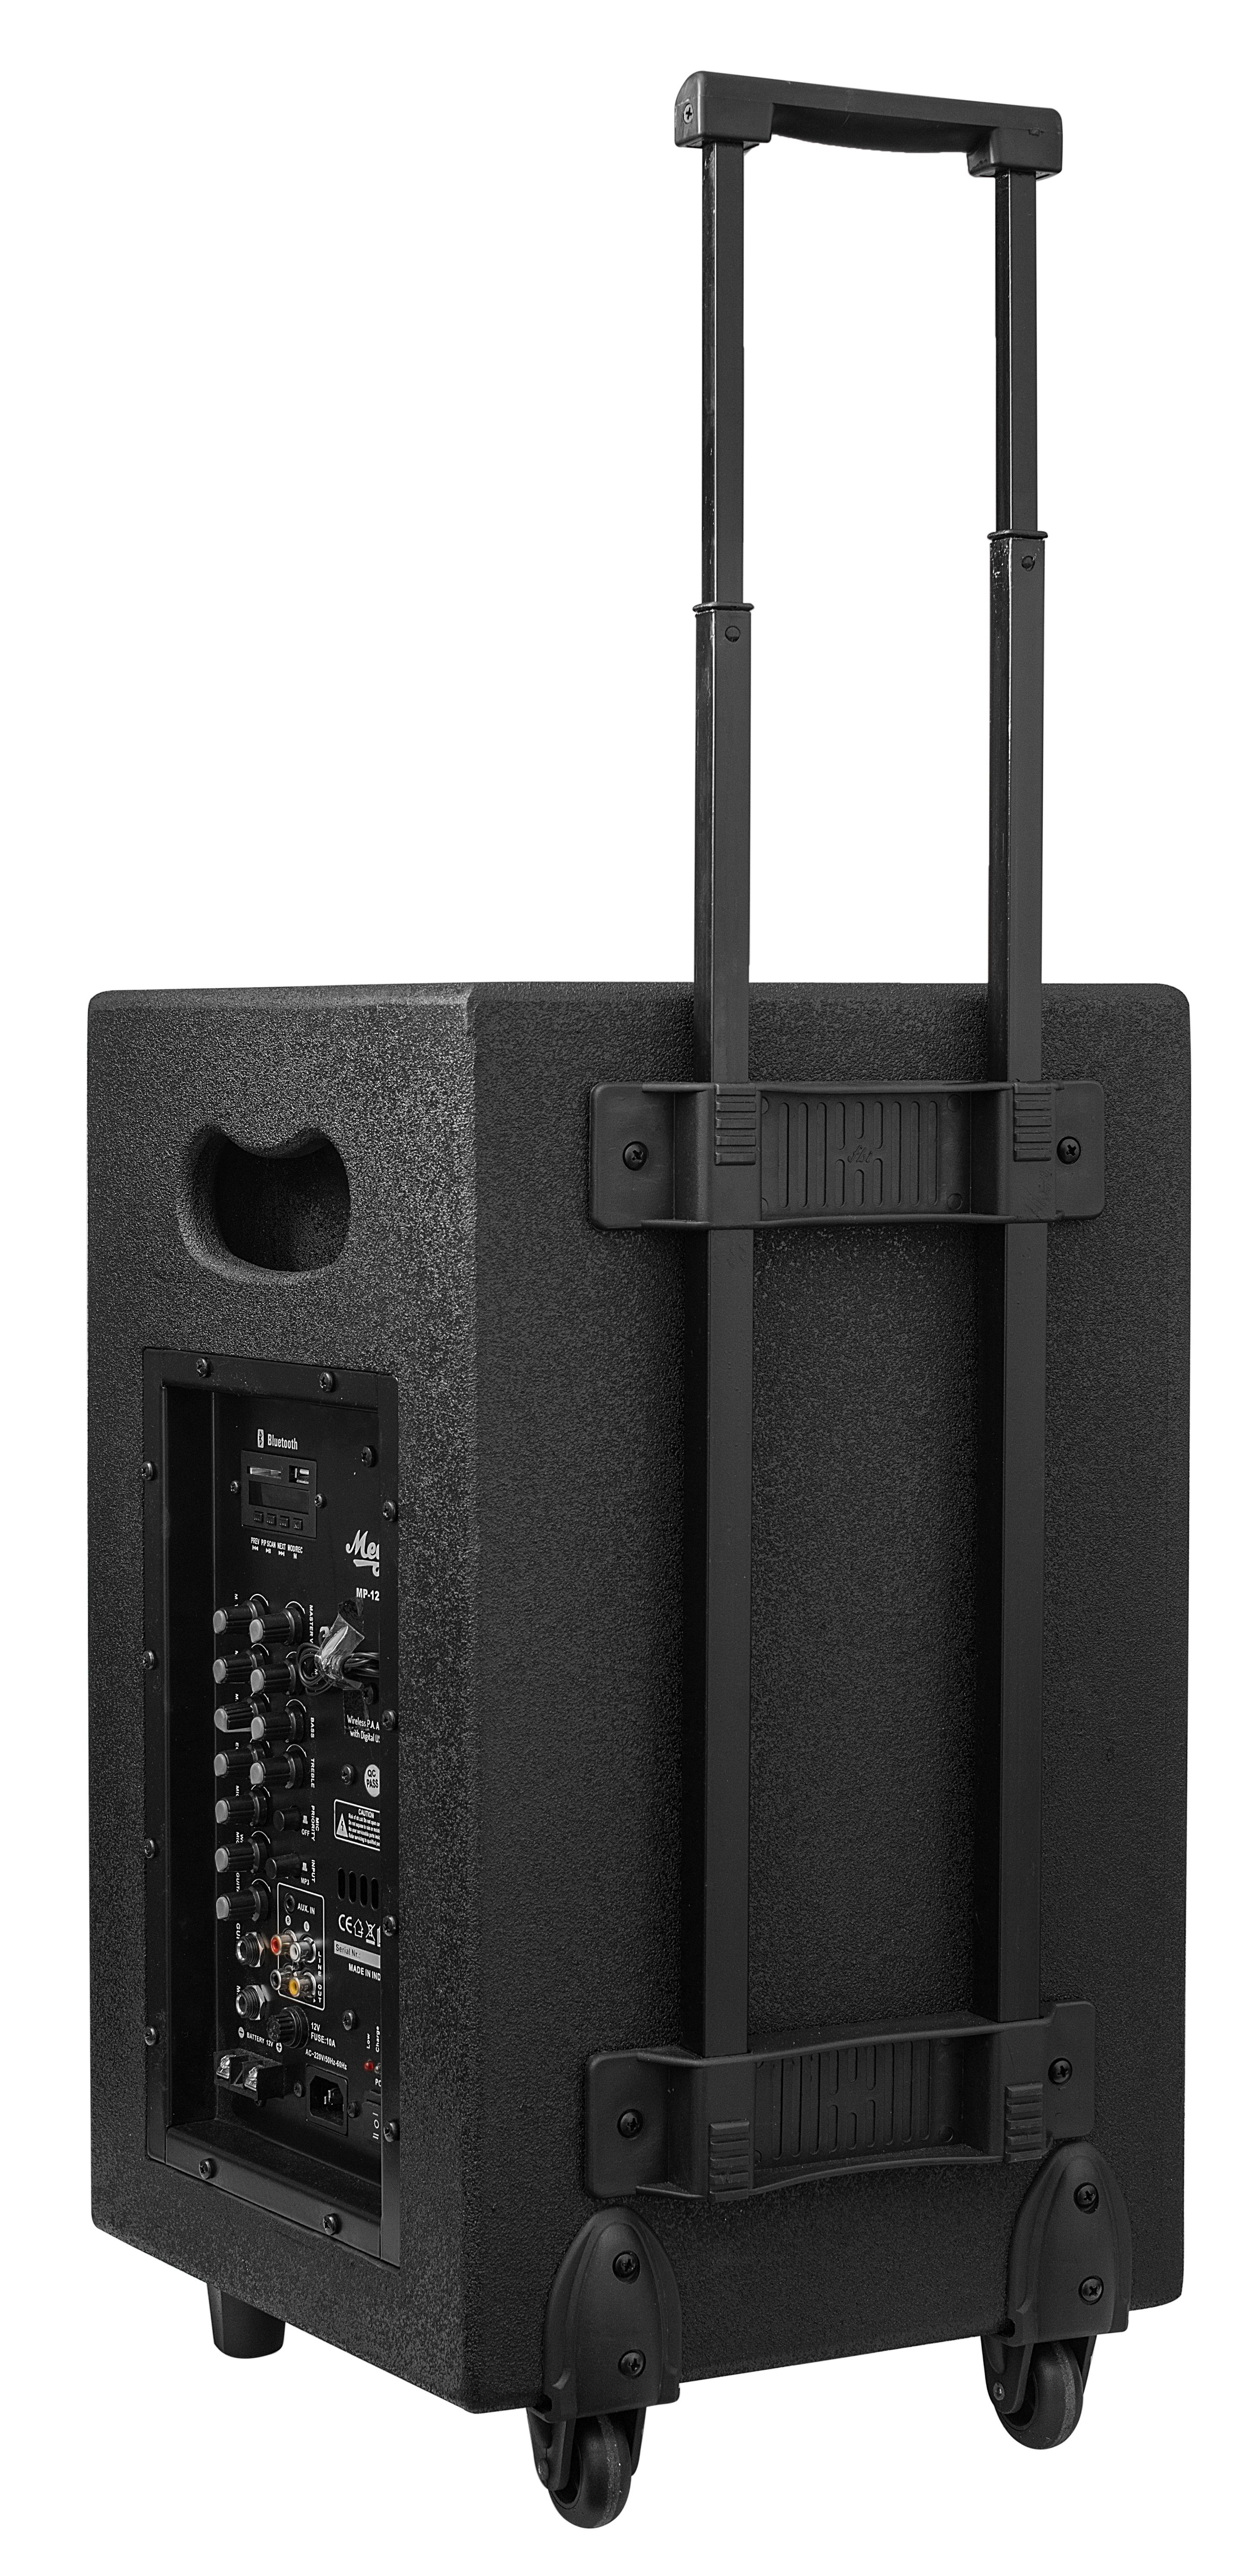 MP-1200